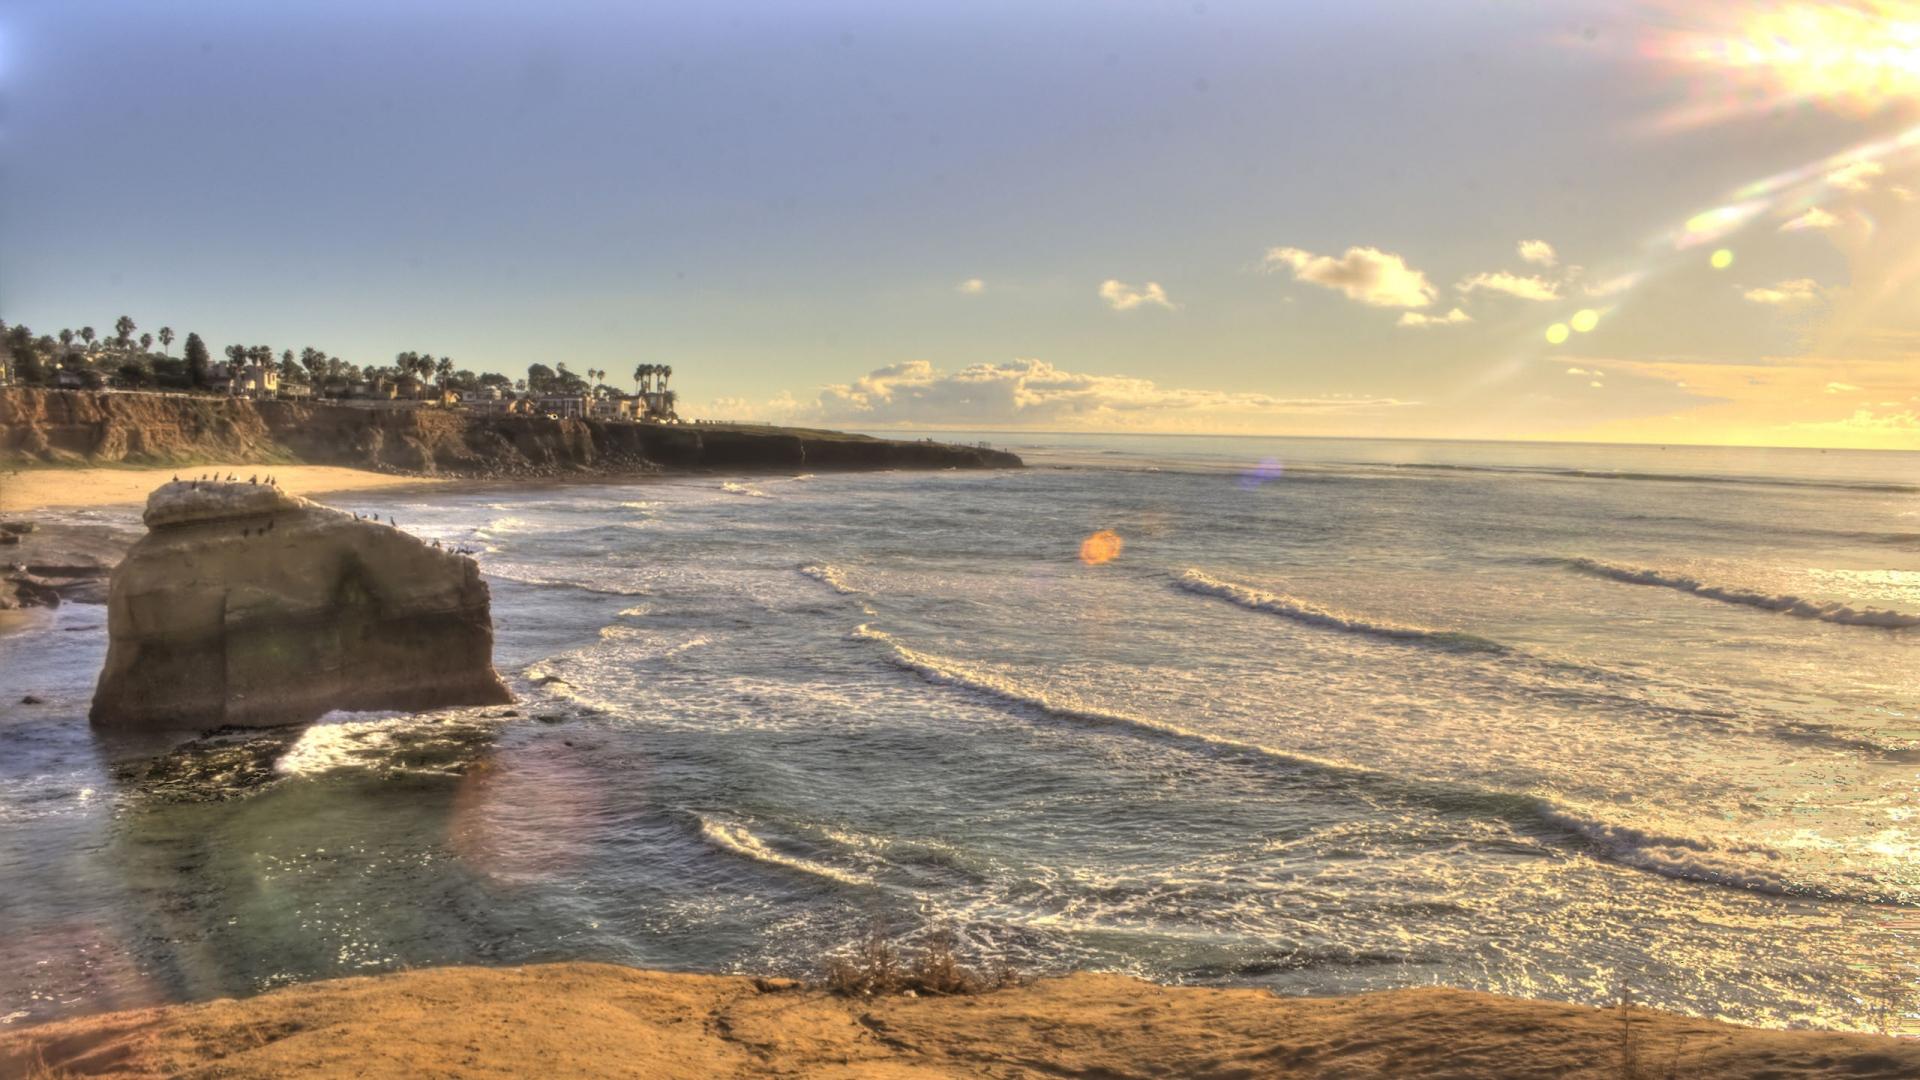 Download Wallpaper 1920x1080 Sunset Beach San Diego California Usa Full Hd 1080p Hd Background